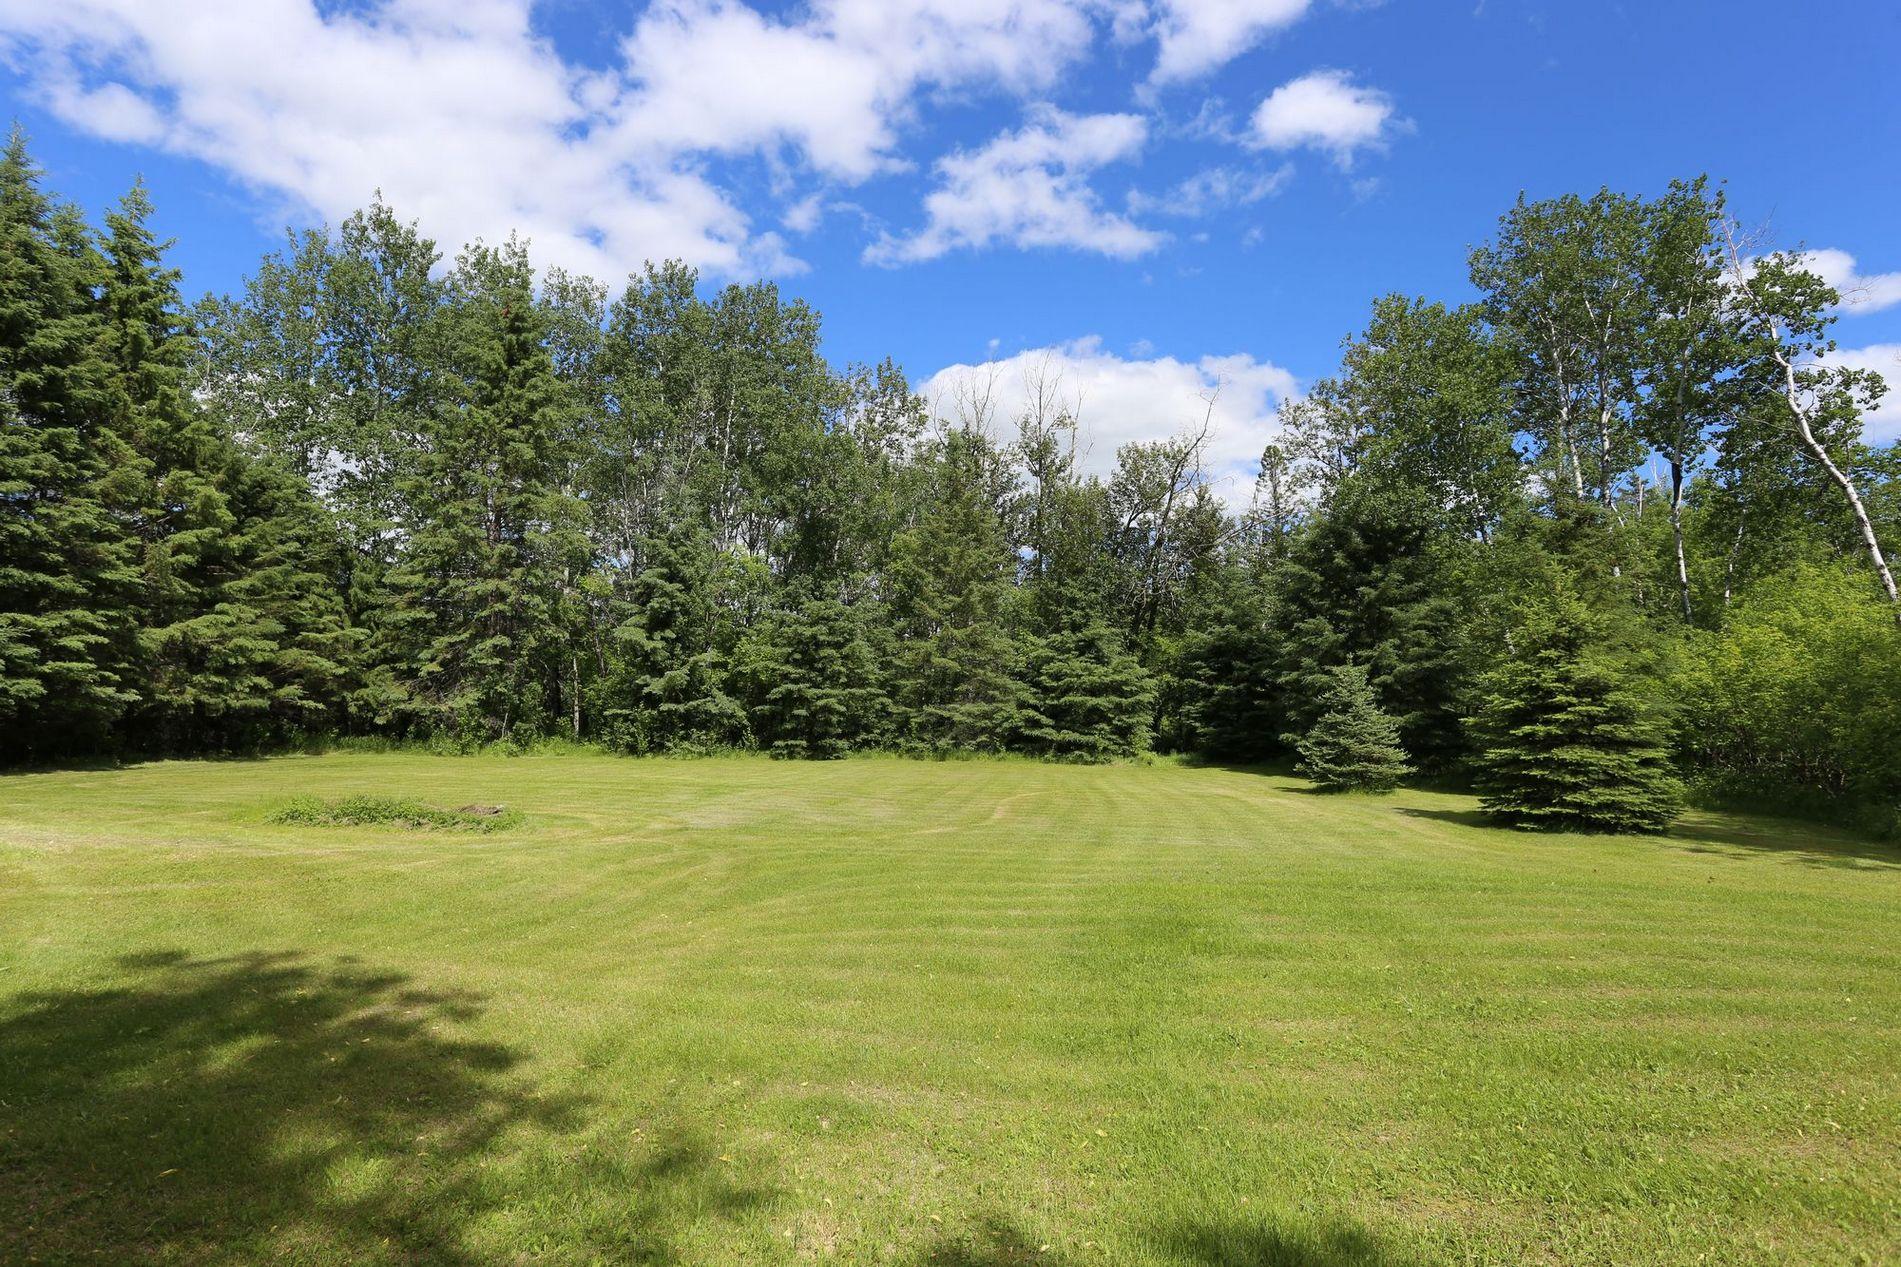 67153 Pineridge Road-Rm Of Springfield-Mb, Winnipeg, Manitoba  R2C 2Z2 - Photo 21 - 1610255